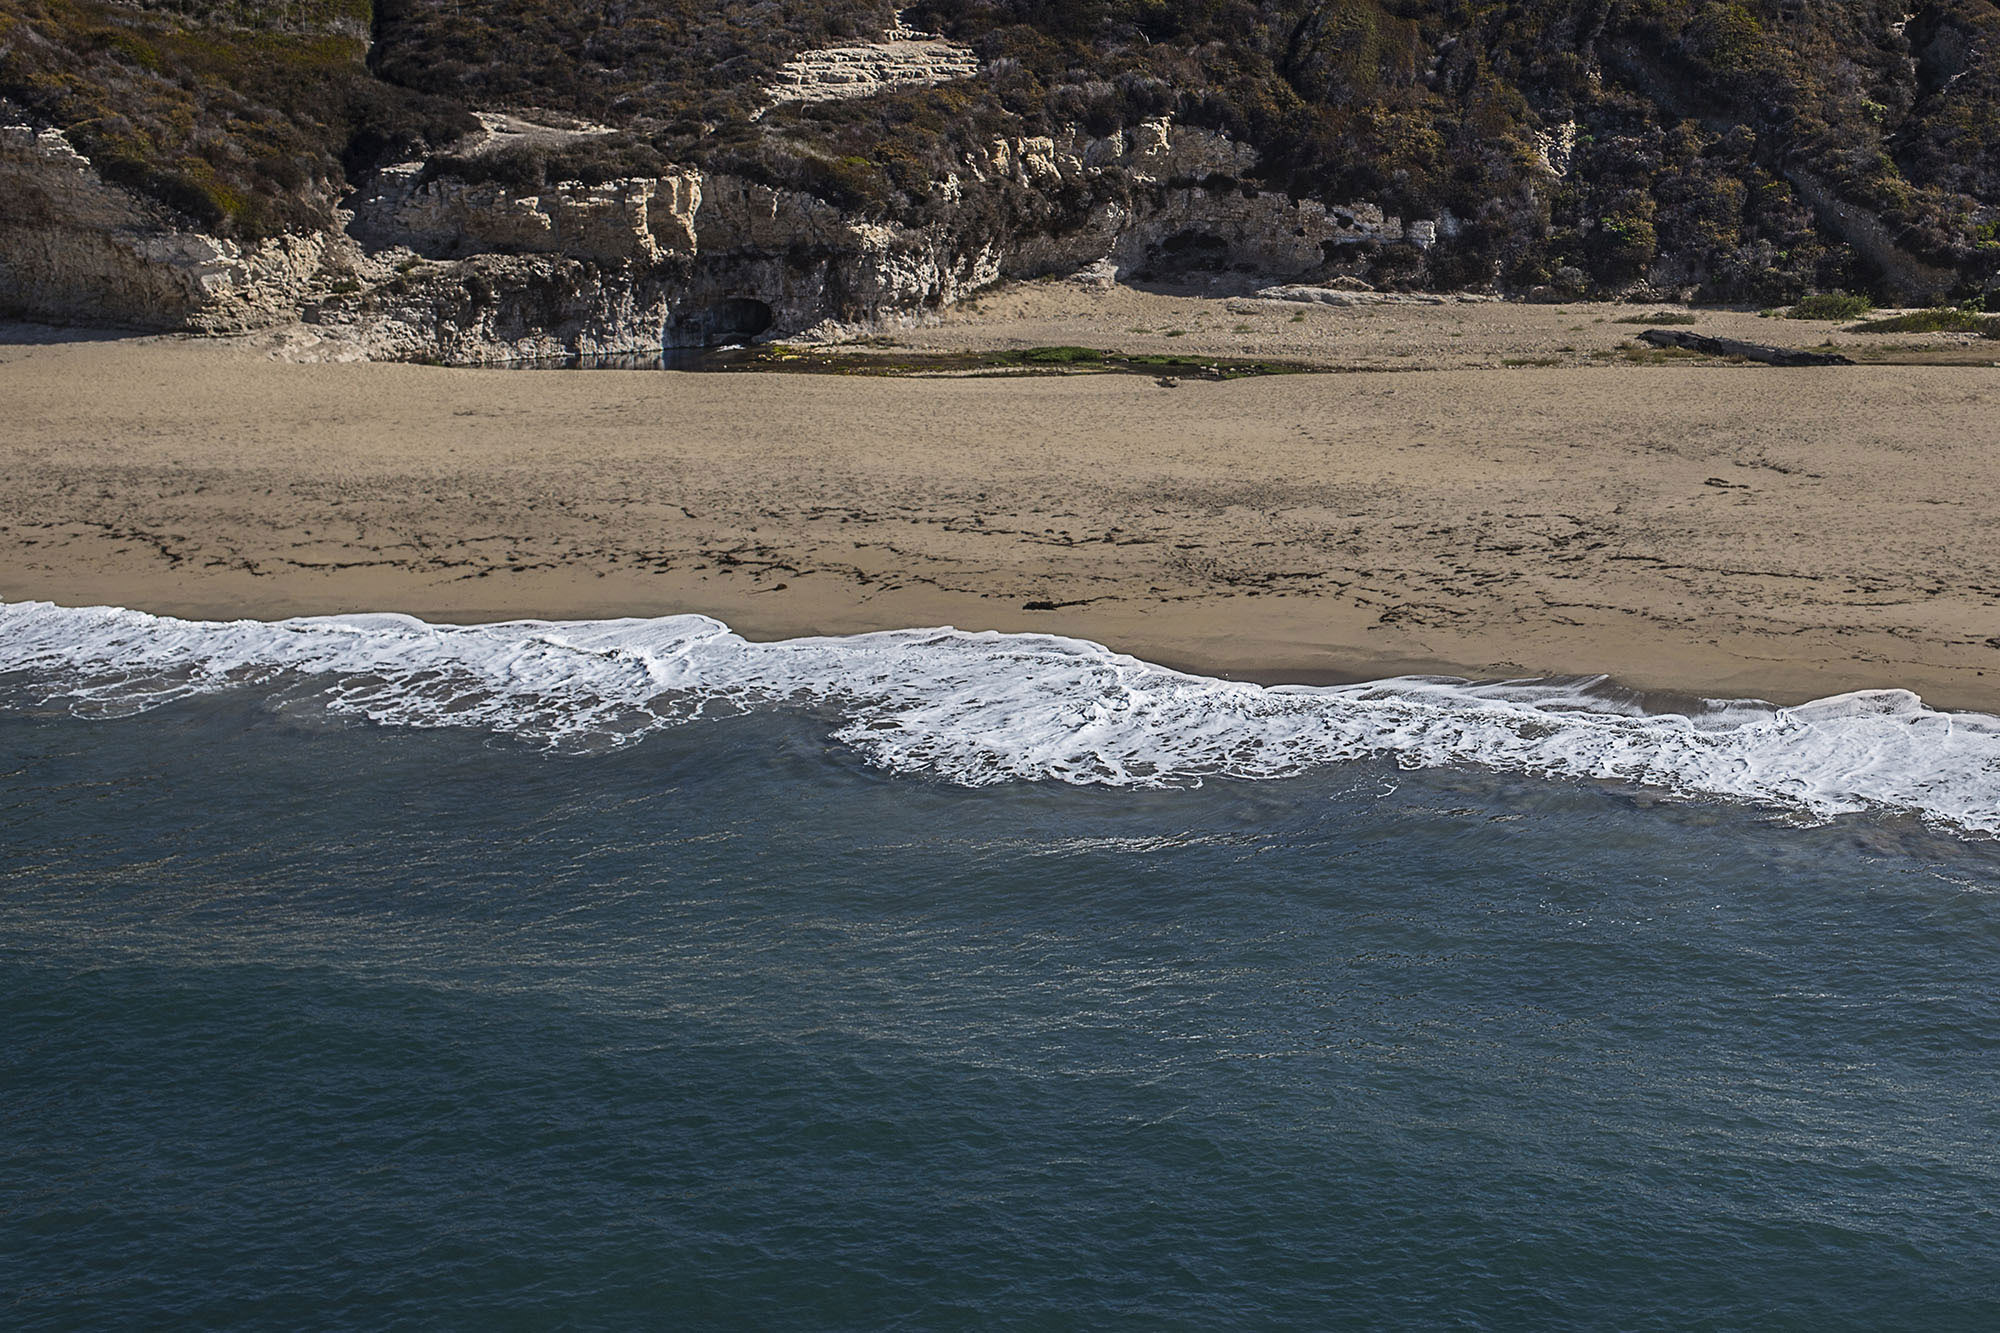 Peacful Shores by Rich J. Velasco